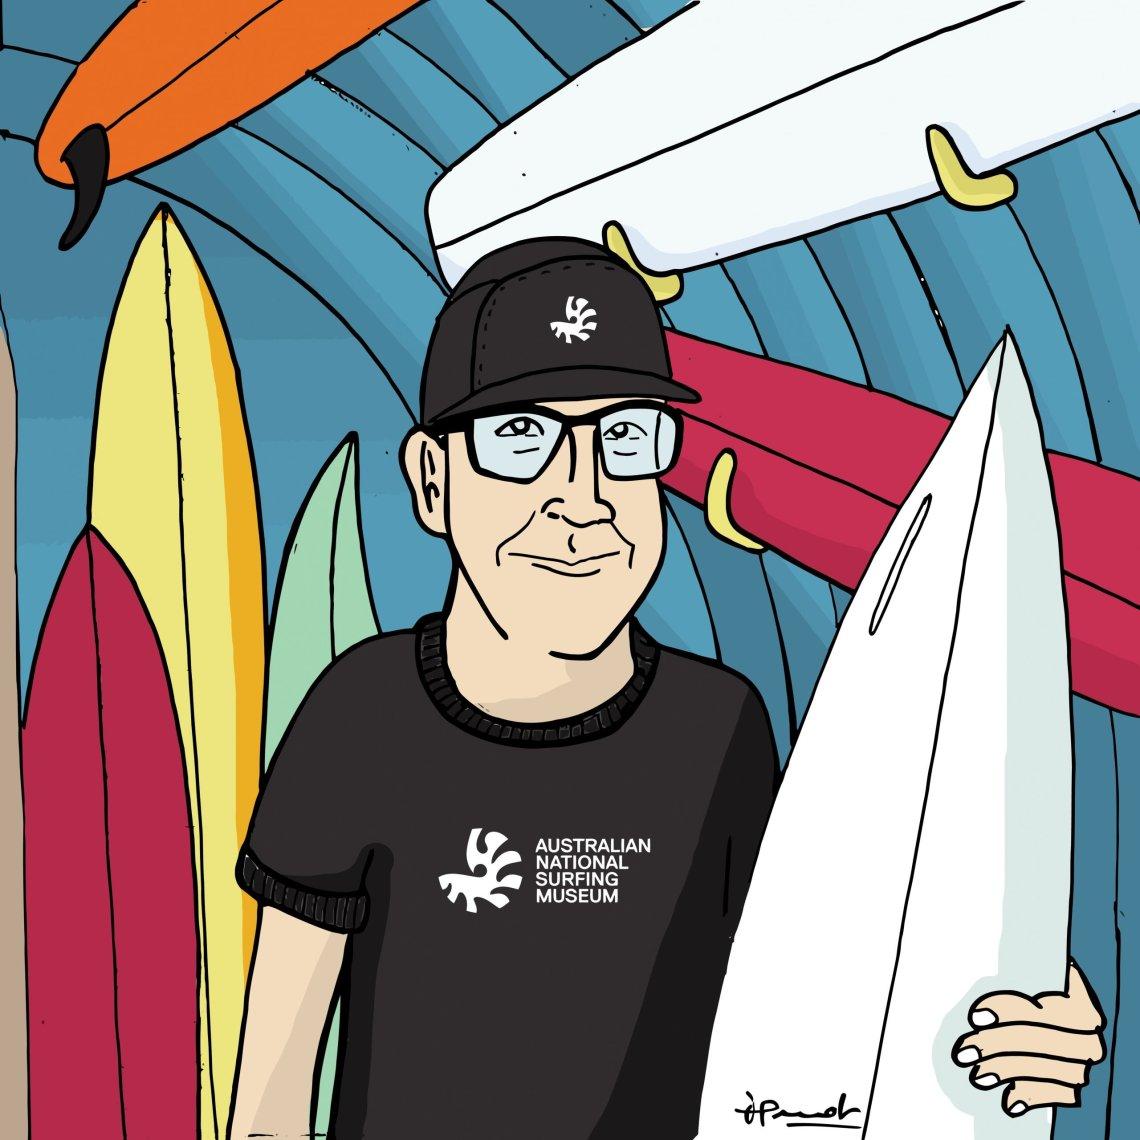 Craig Baird Australian National Surf Museum